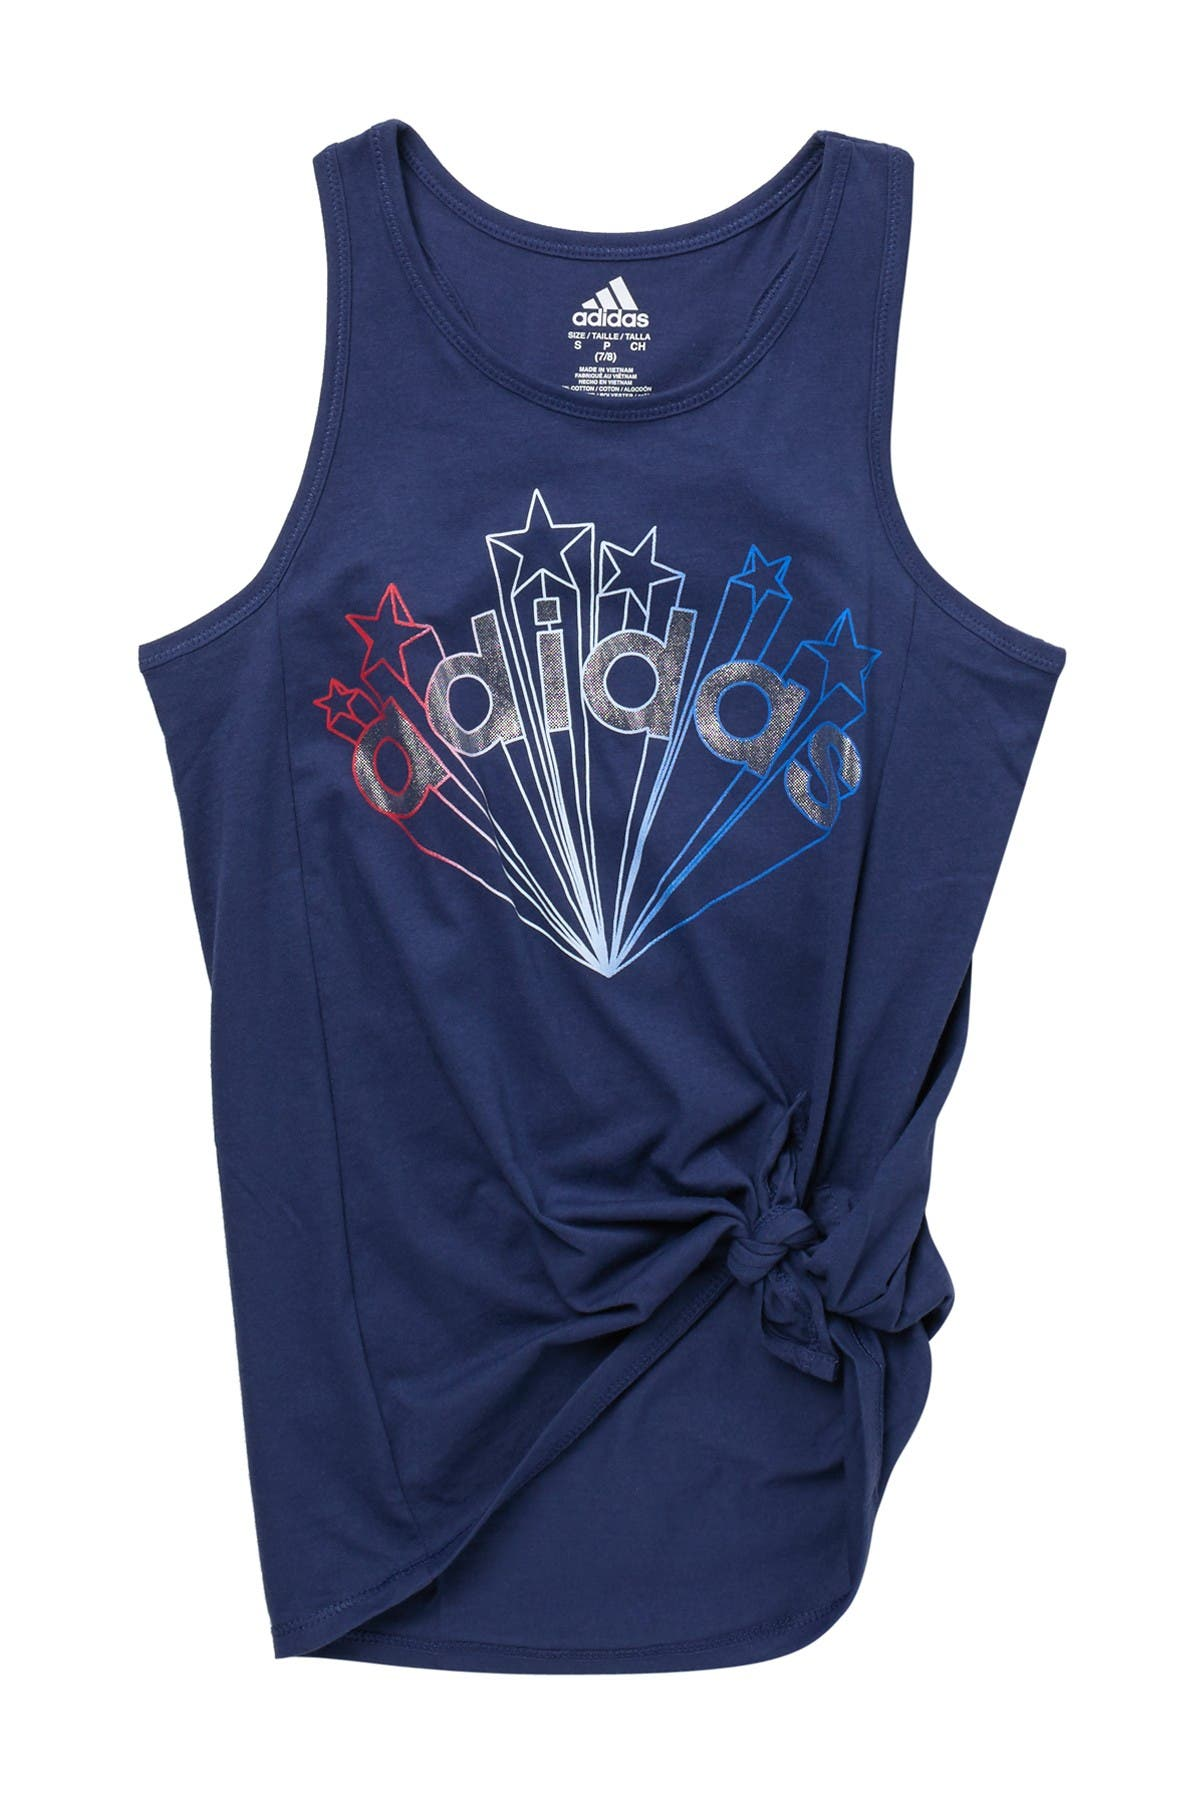 Image of ADIDAS ORIGINALS Sleeveless Logo Star Print Side Tie Tank